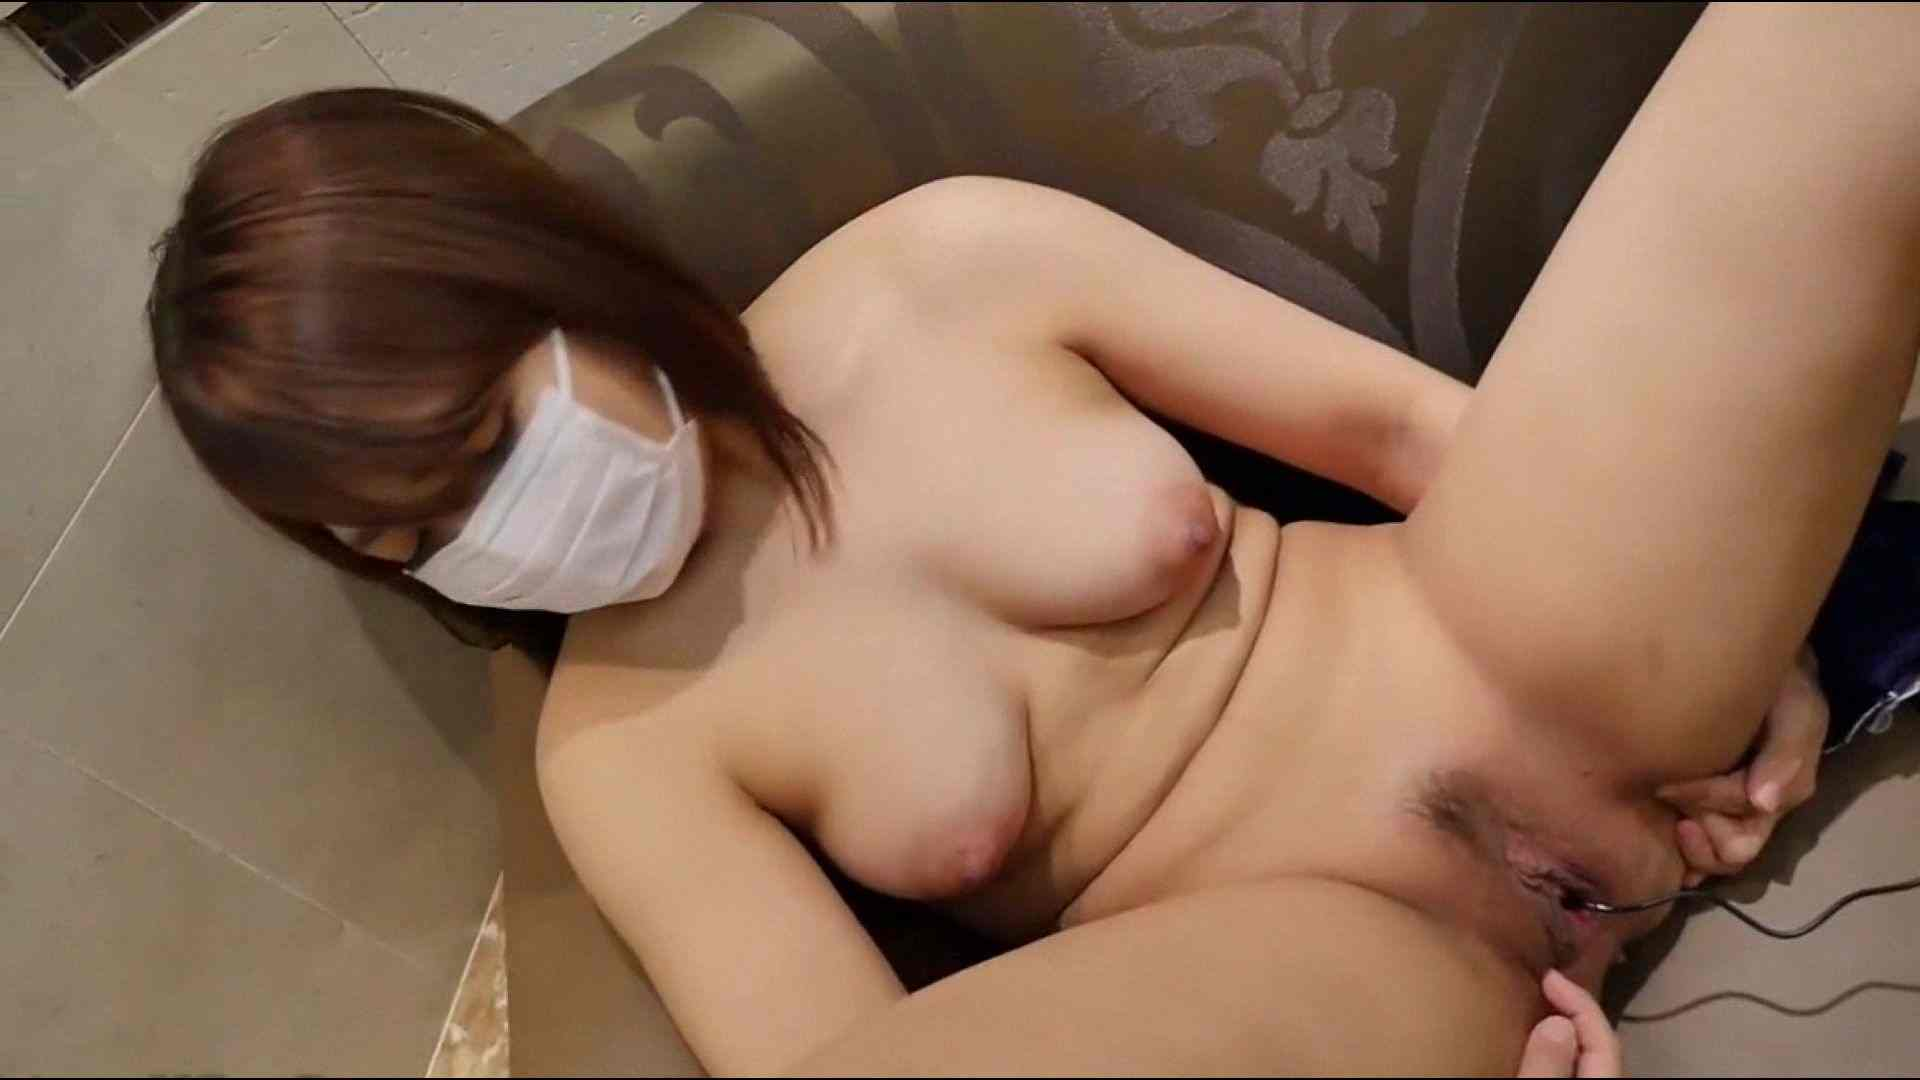 S級厳選美女ビッチガールVol.41 前編 OL女体  105連発 14